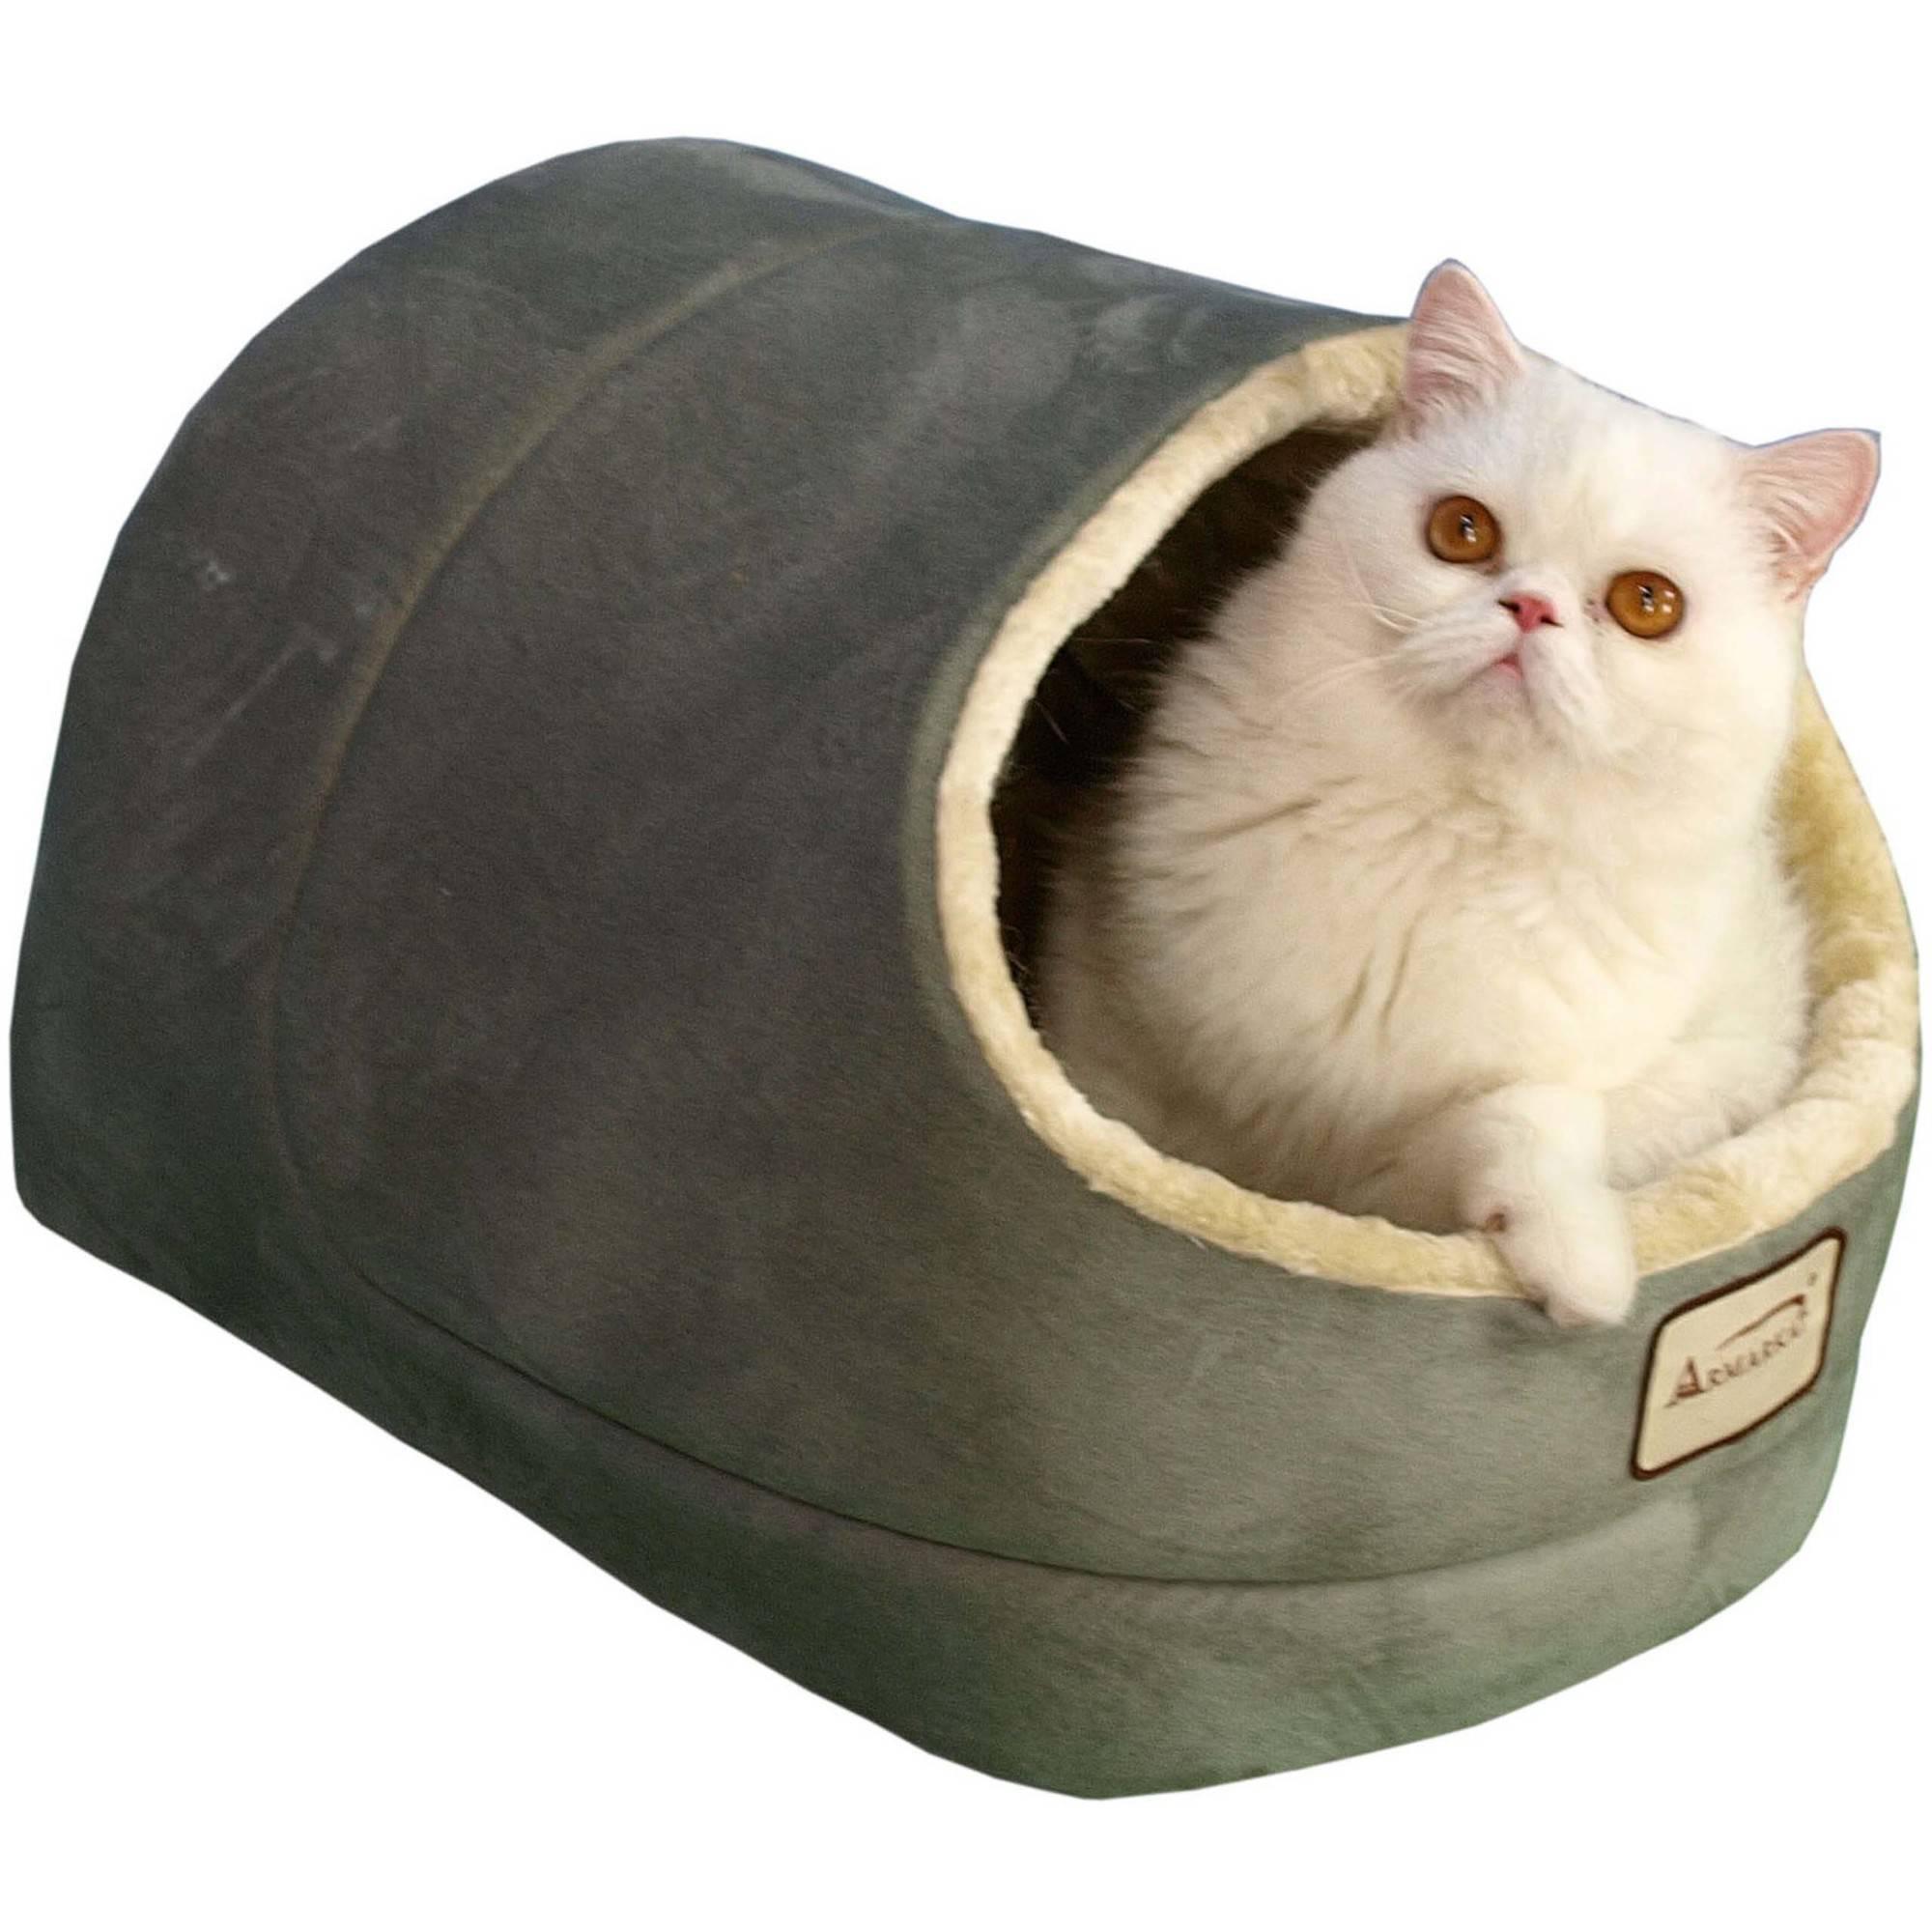 cat wont use litter box